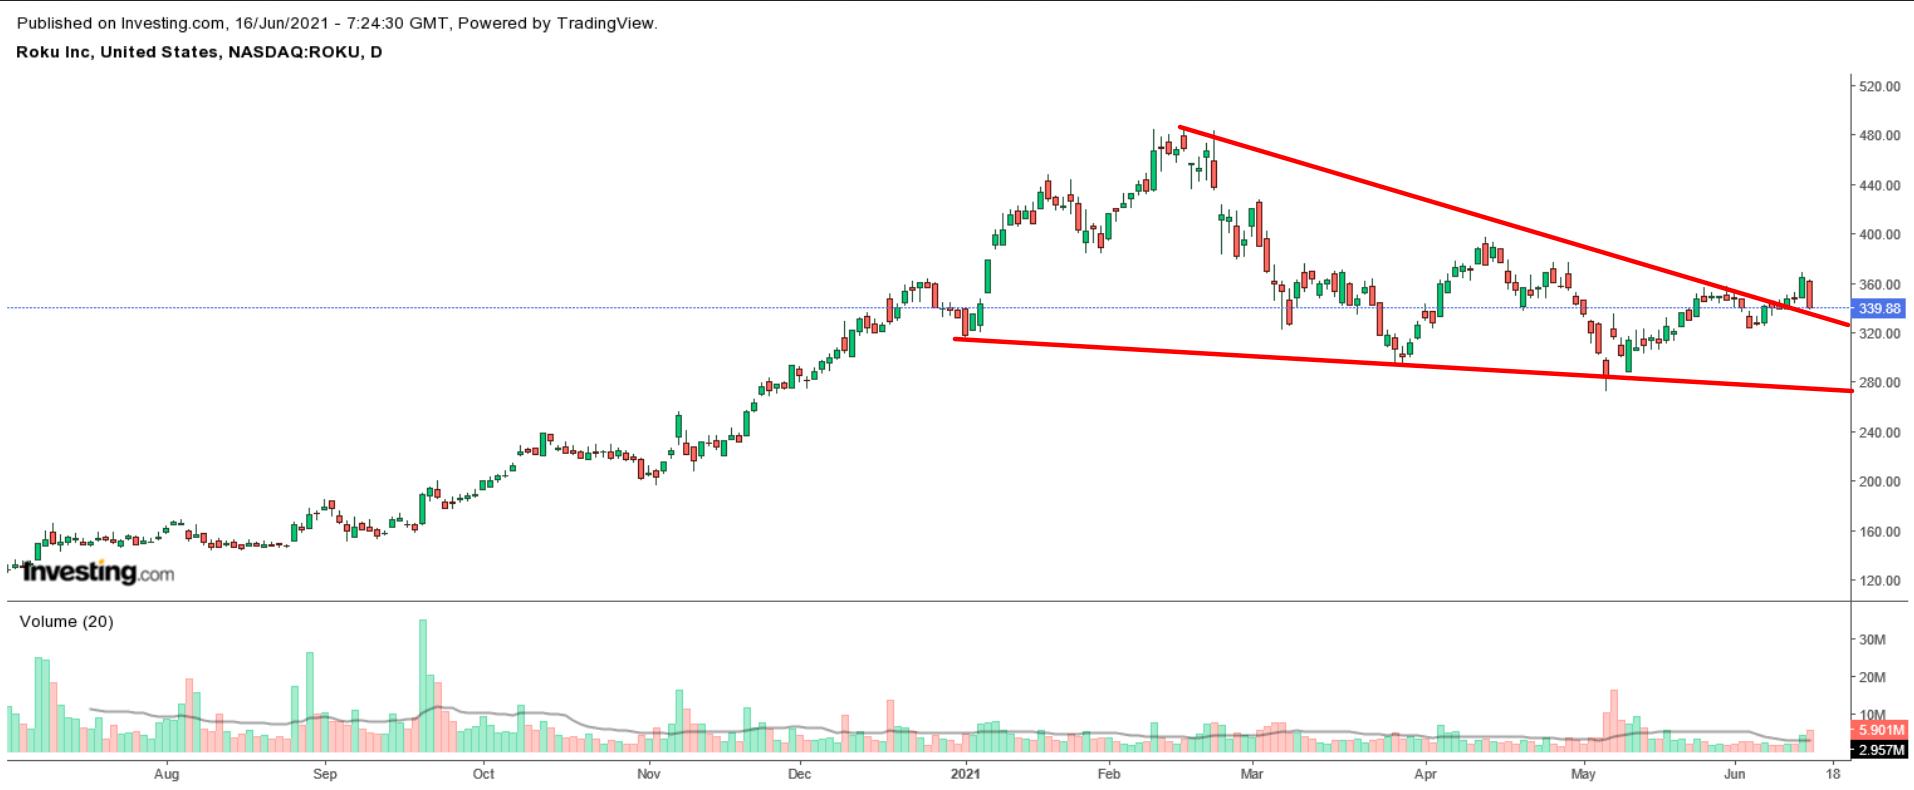 Roku Daily Stock Chart